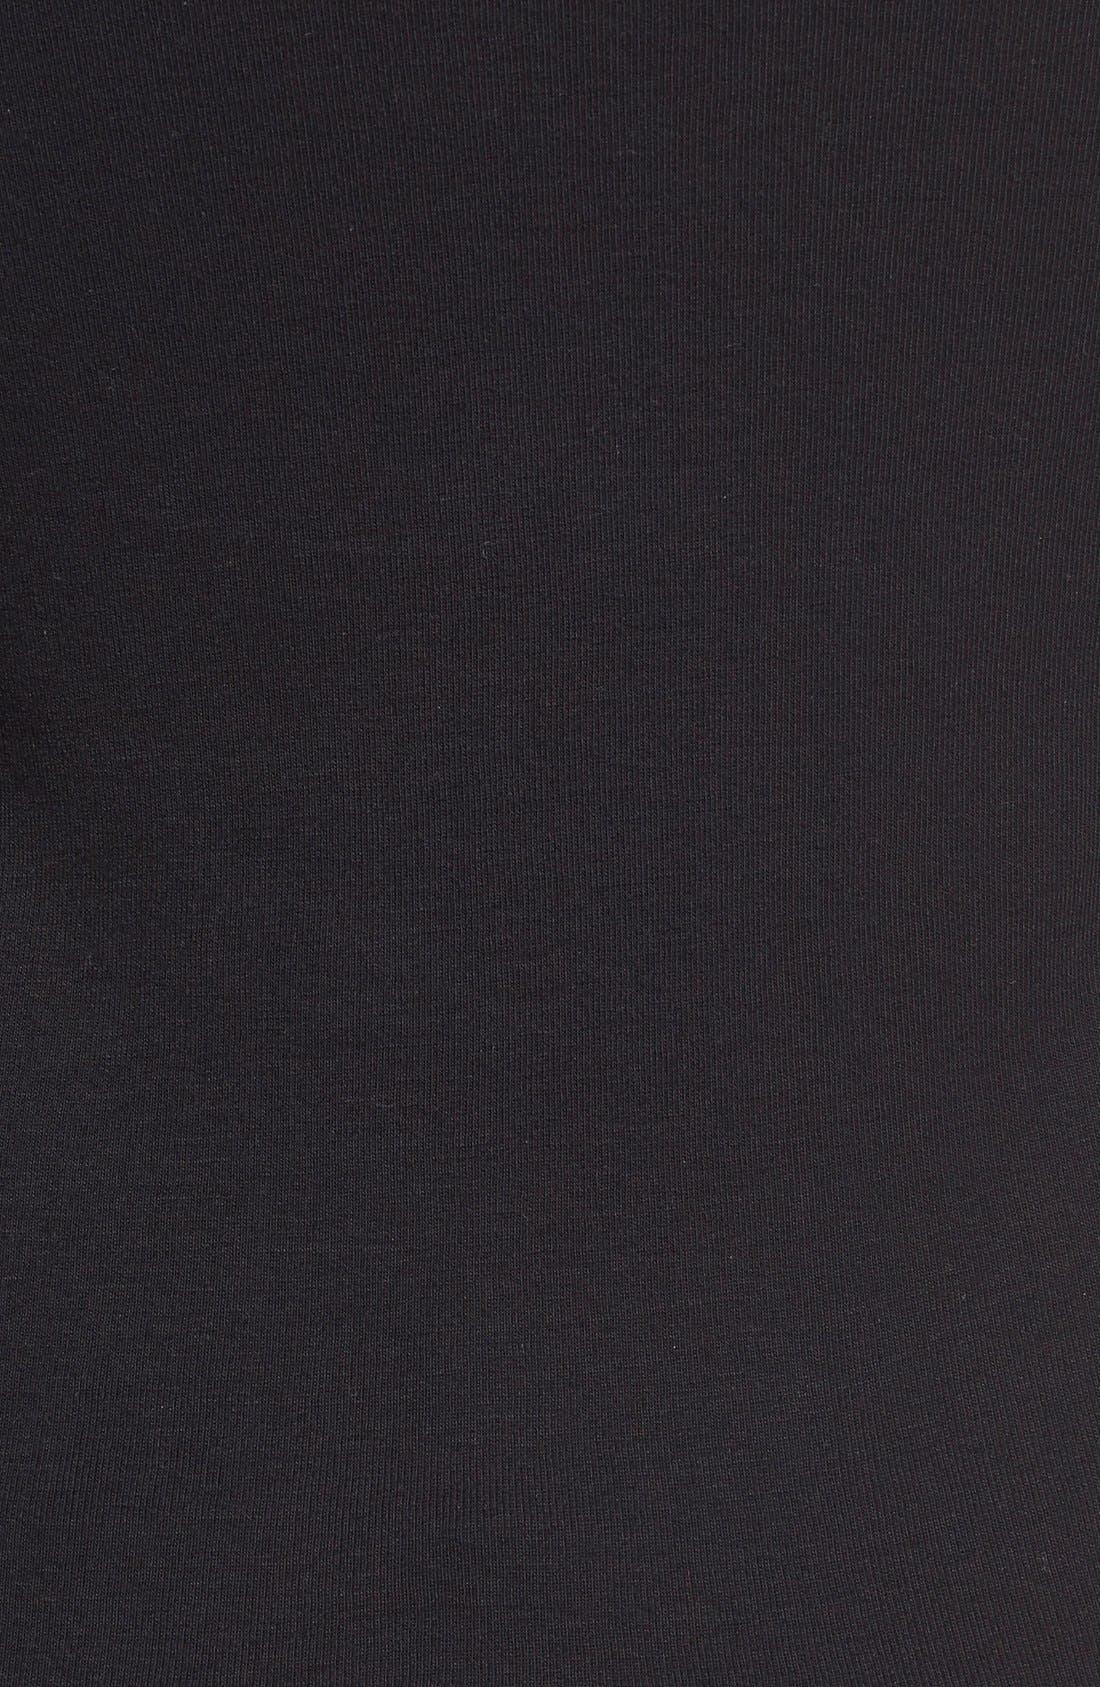 Long Sleeve Crewneck Tee,                             Alternate thumbnail 5, color,                             BLACK